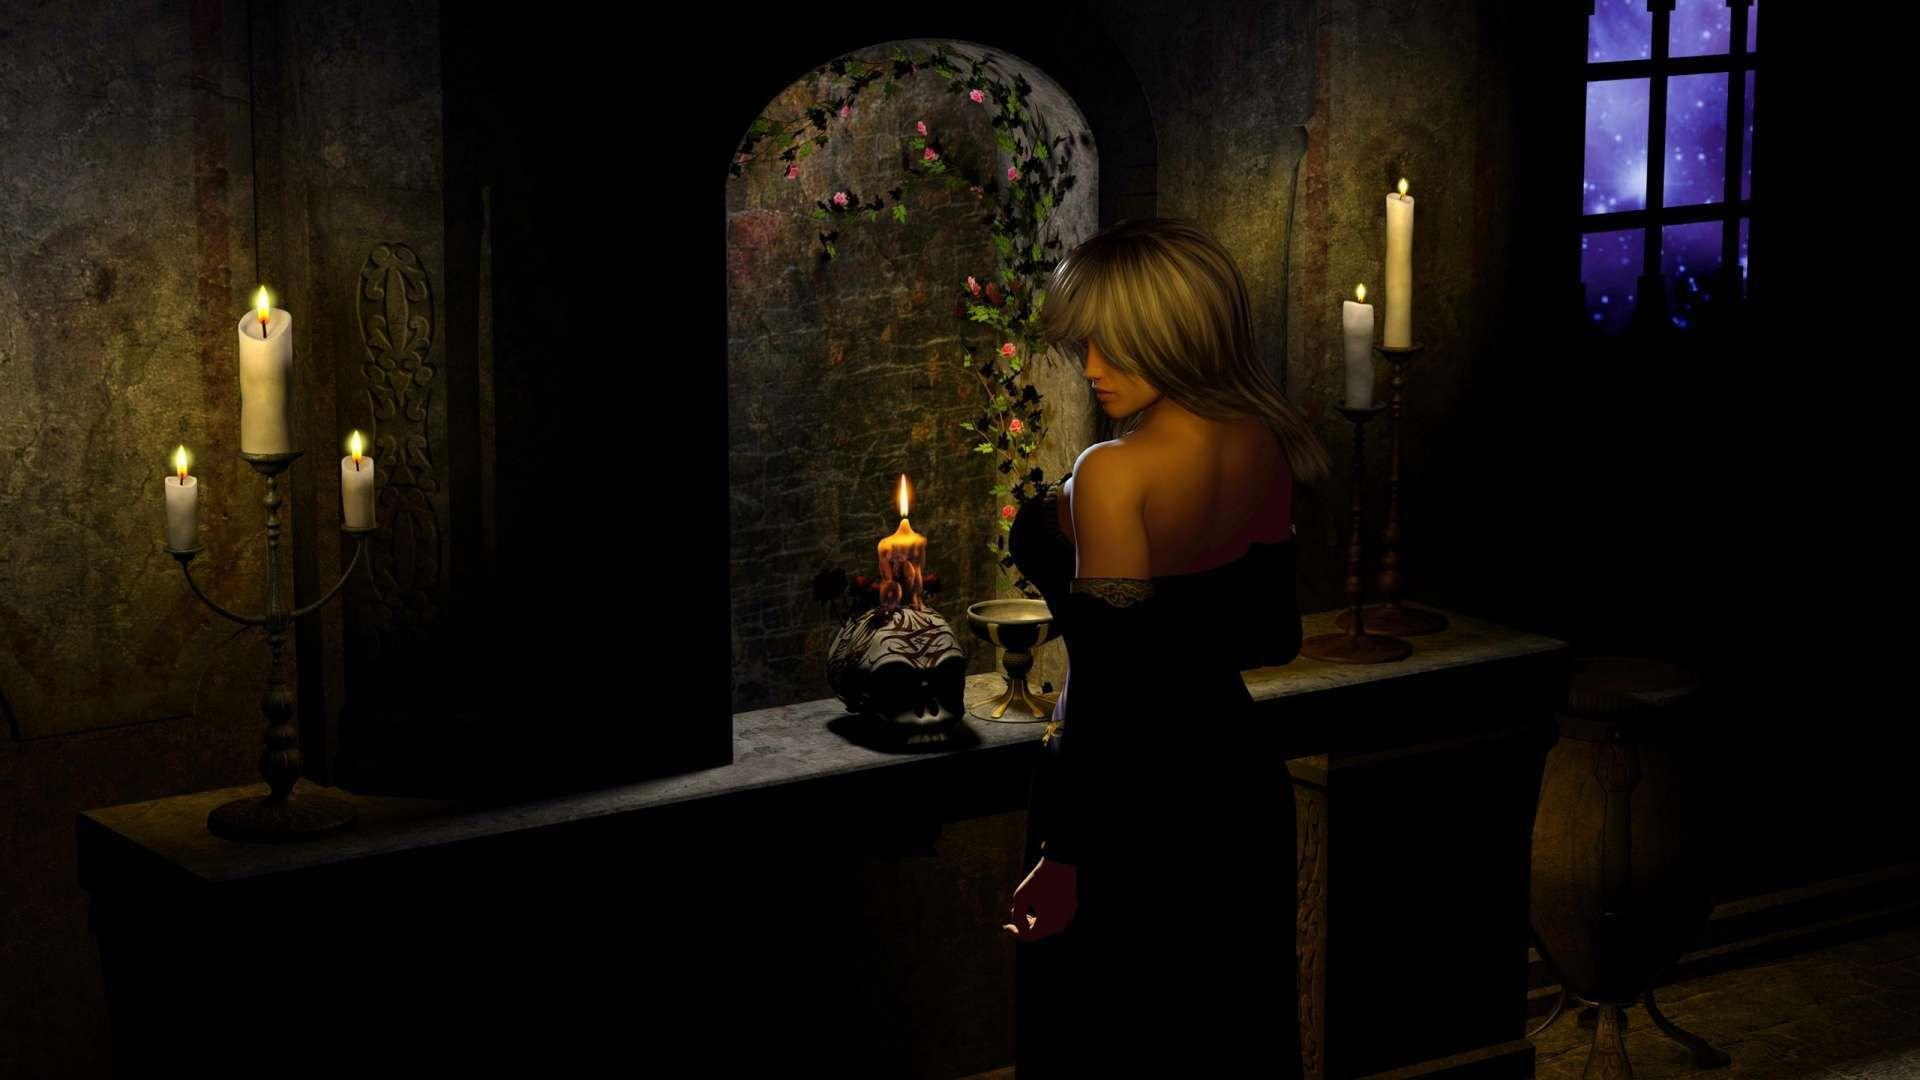 Girl Window Stars Night Flowers Candles Skull Gothic Hd Wallpaper